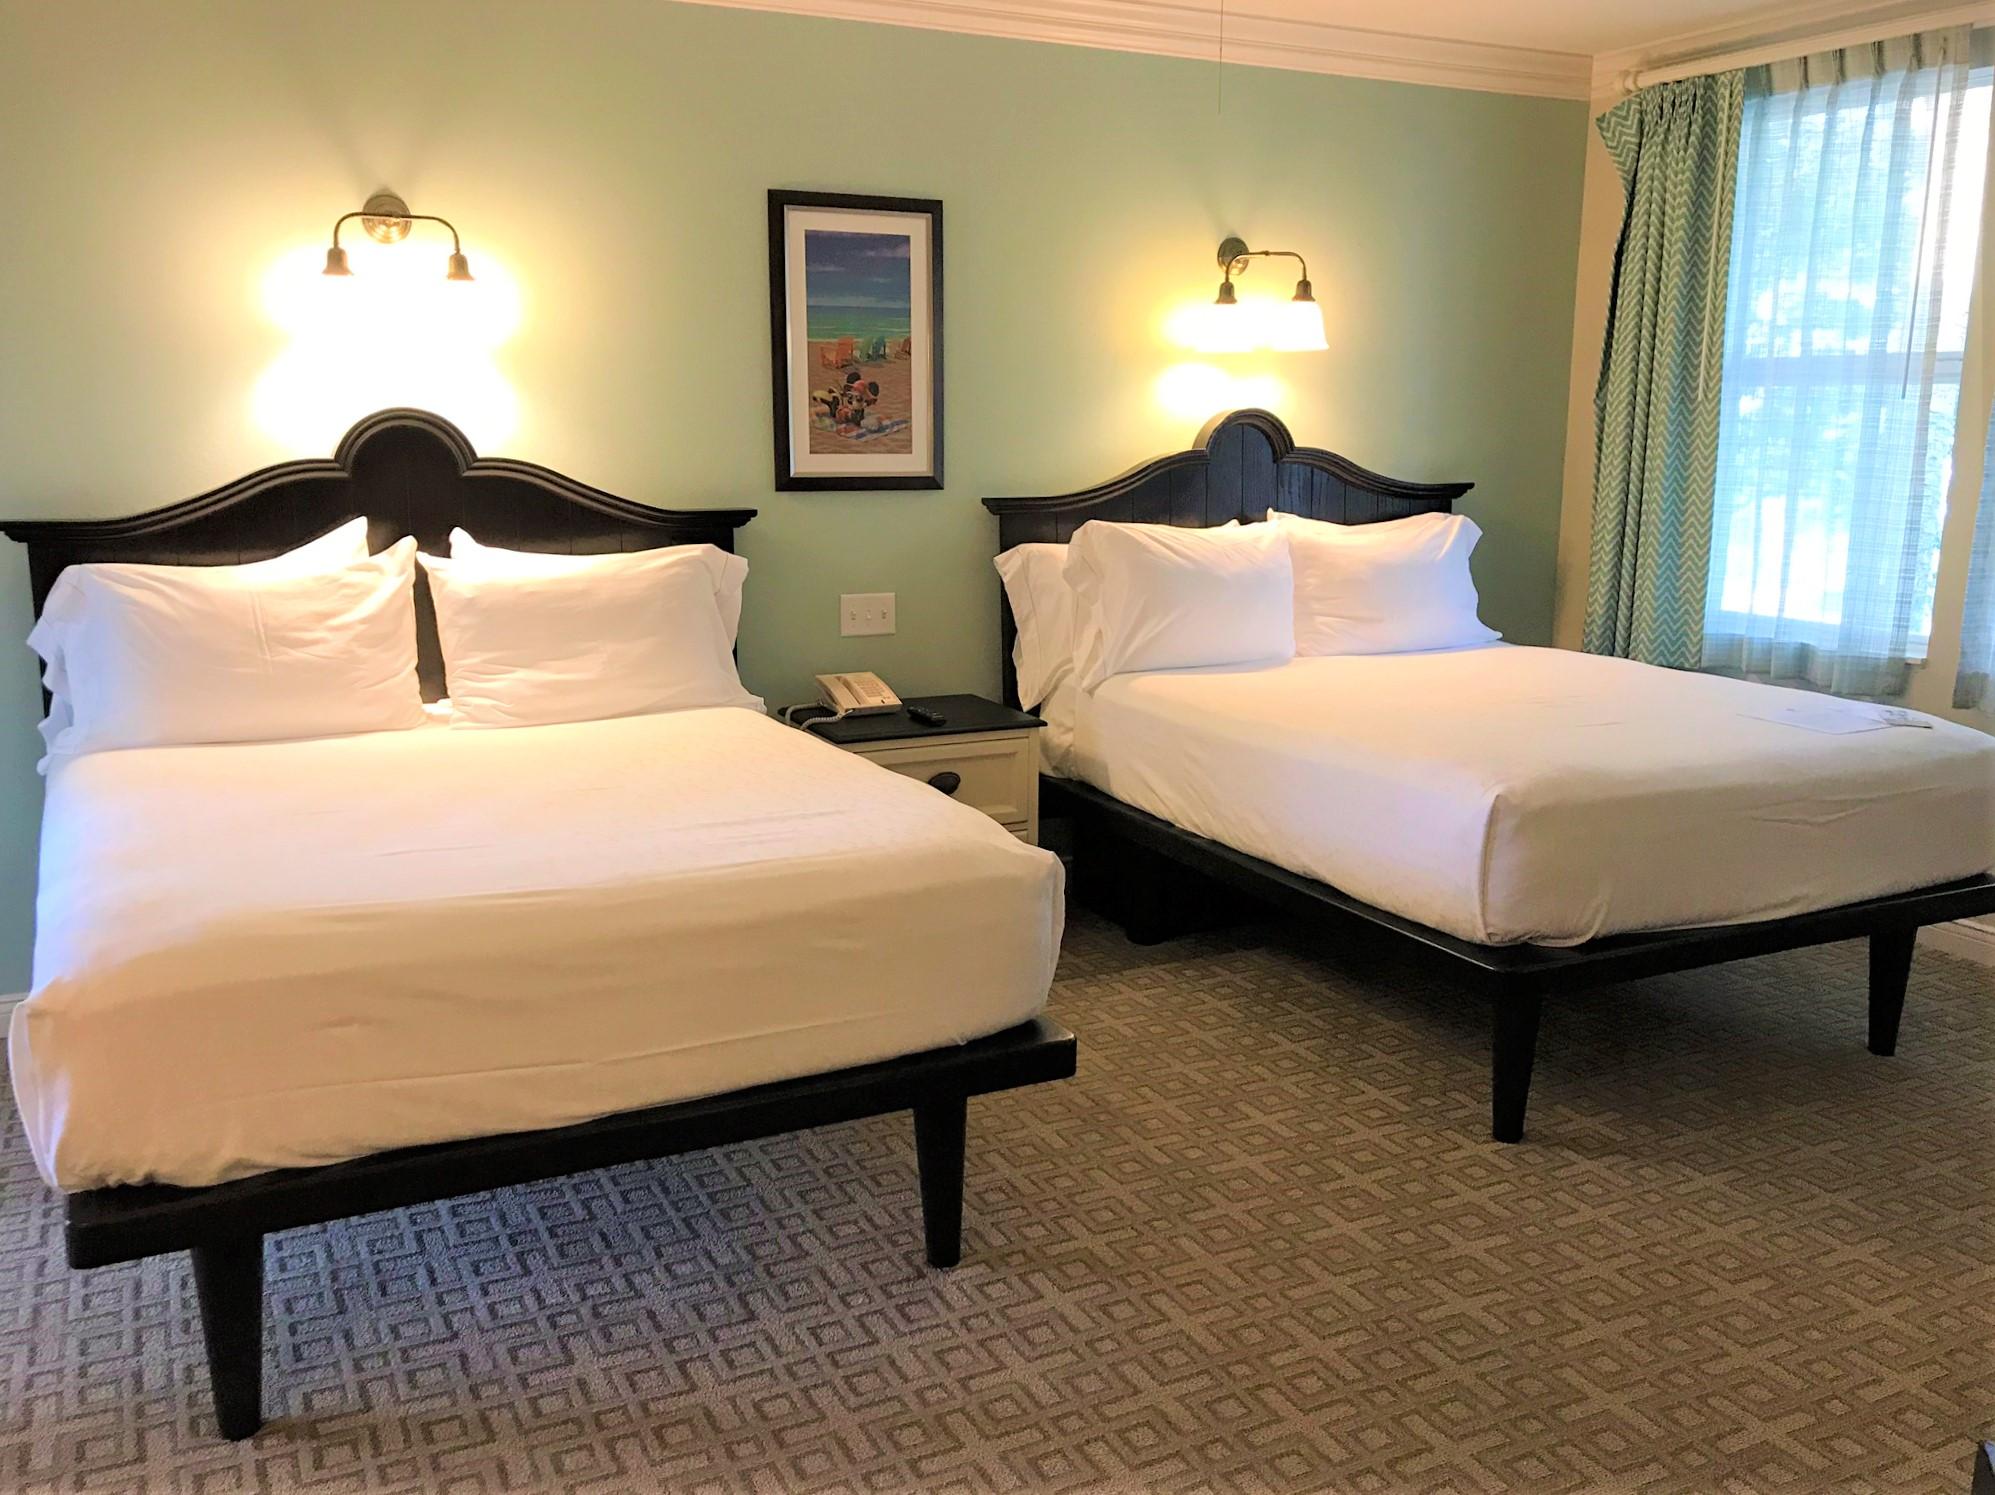 rent dvc points for a studio villa at Disney's Old Key West resort